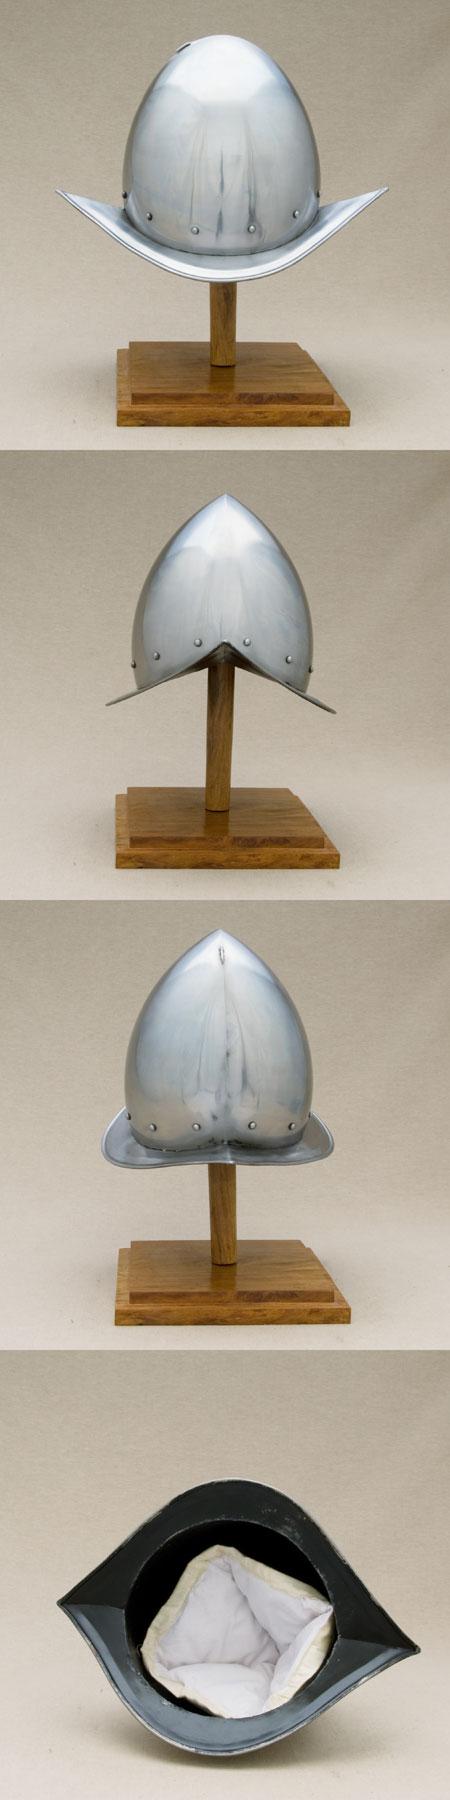 Medieval pikemen's helmet Cabasset